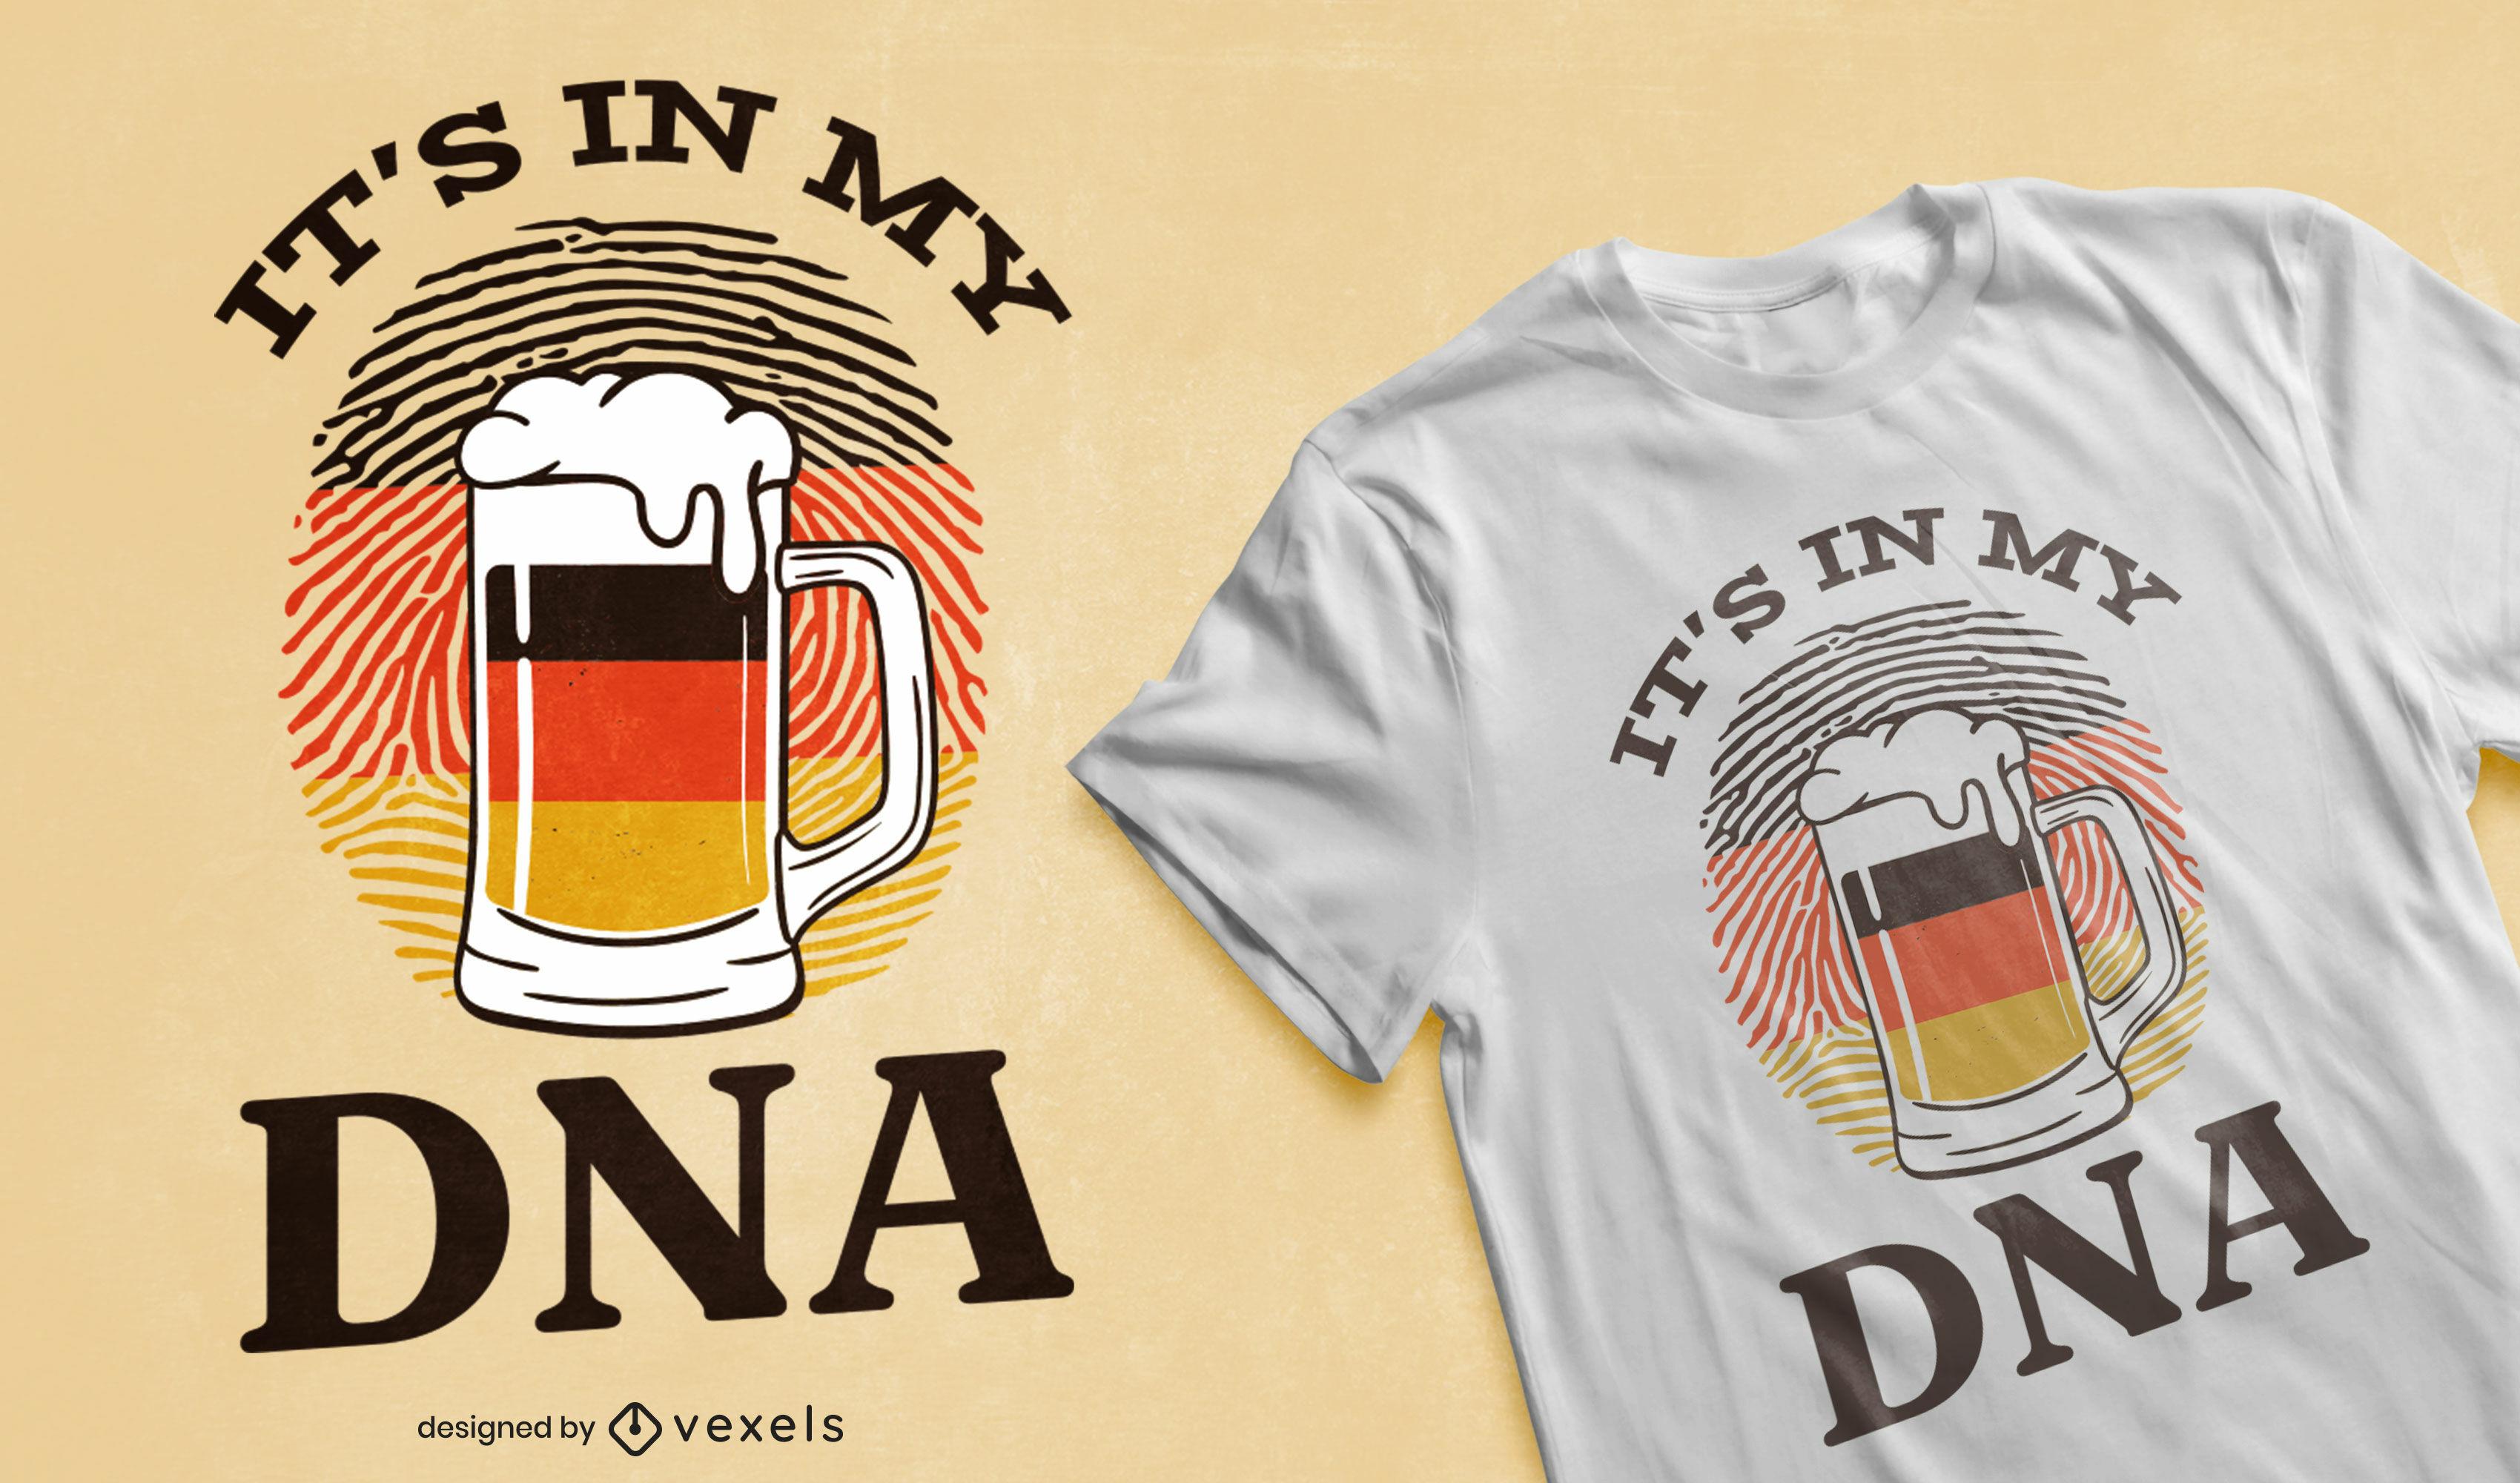 Dise?o de camiseta de adn alem?n de cerveza.